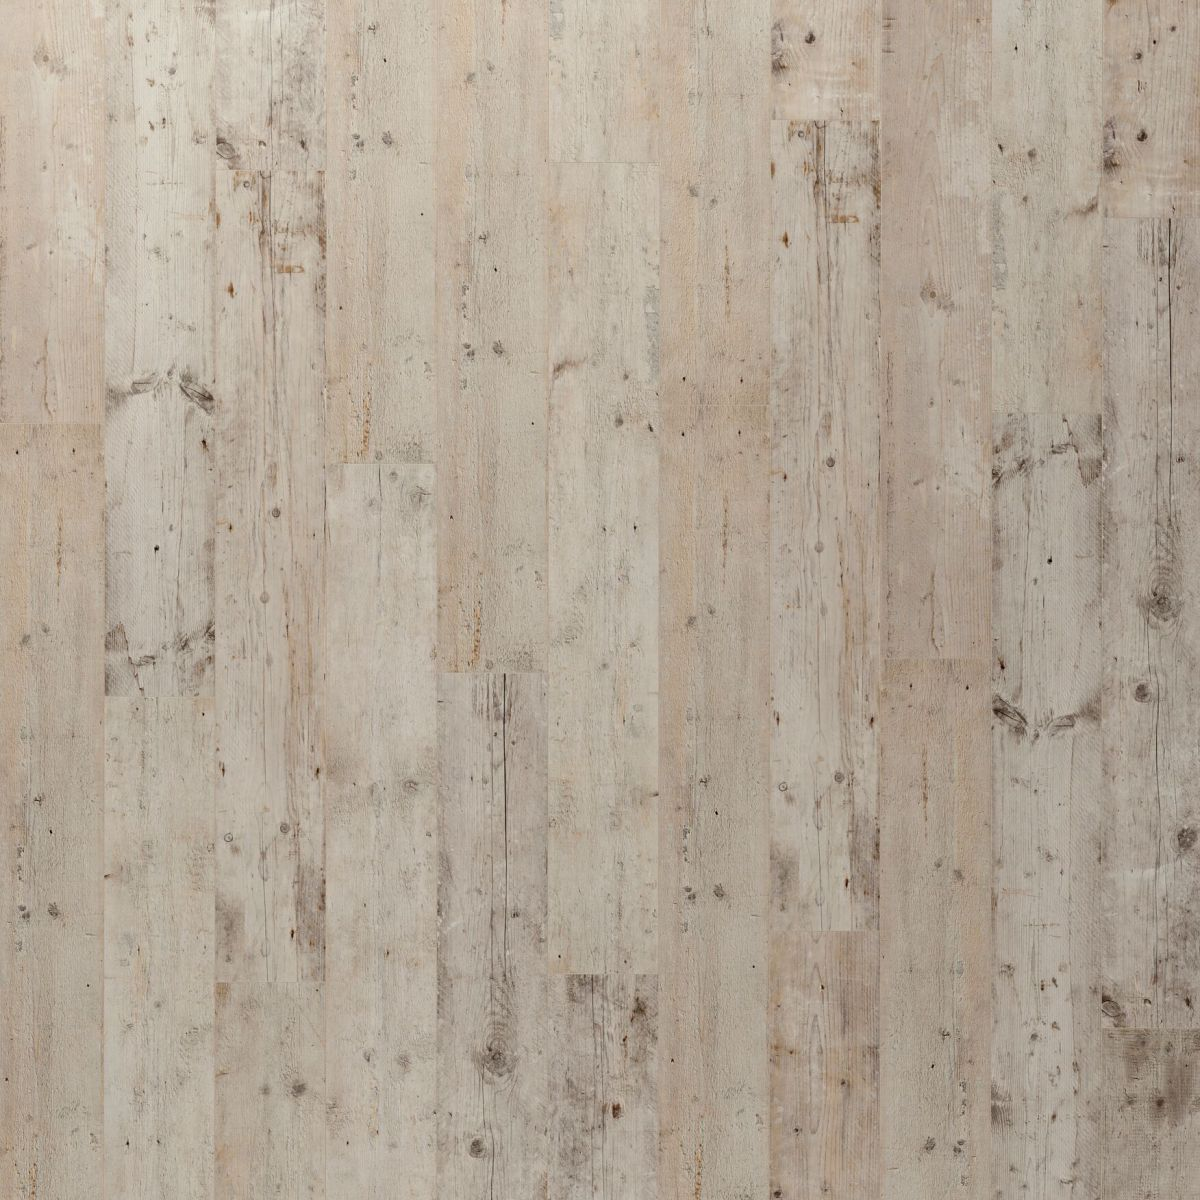 Avatara vloerdelen hout K07 plan